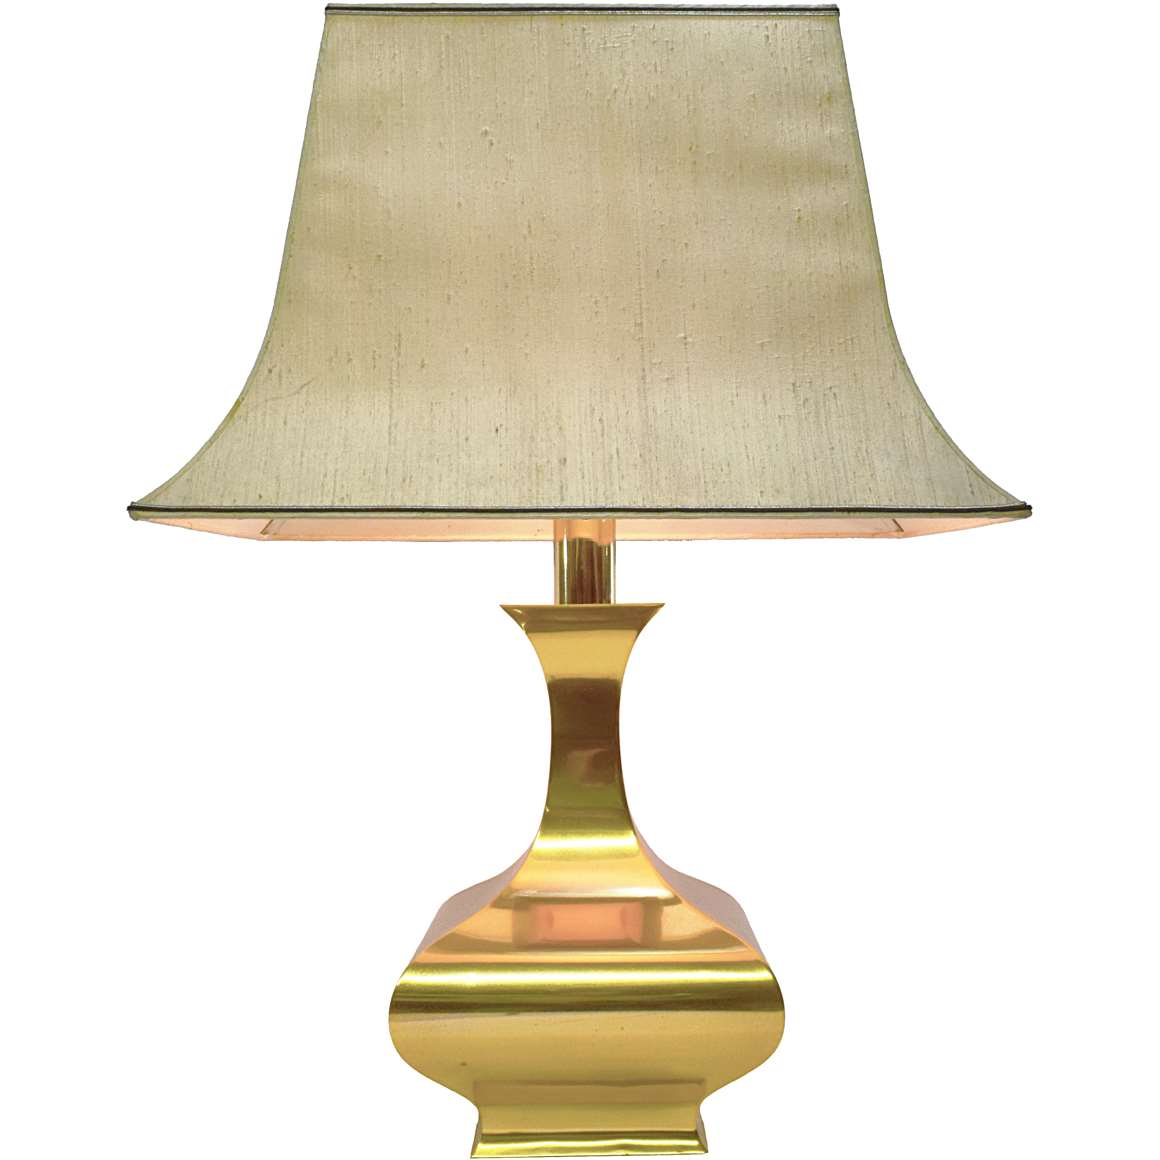 Maria Pergay Balustre Table Lamp